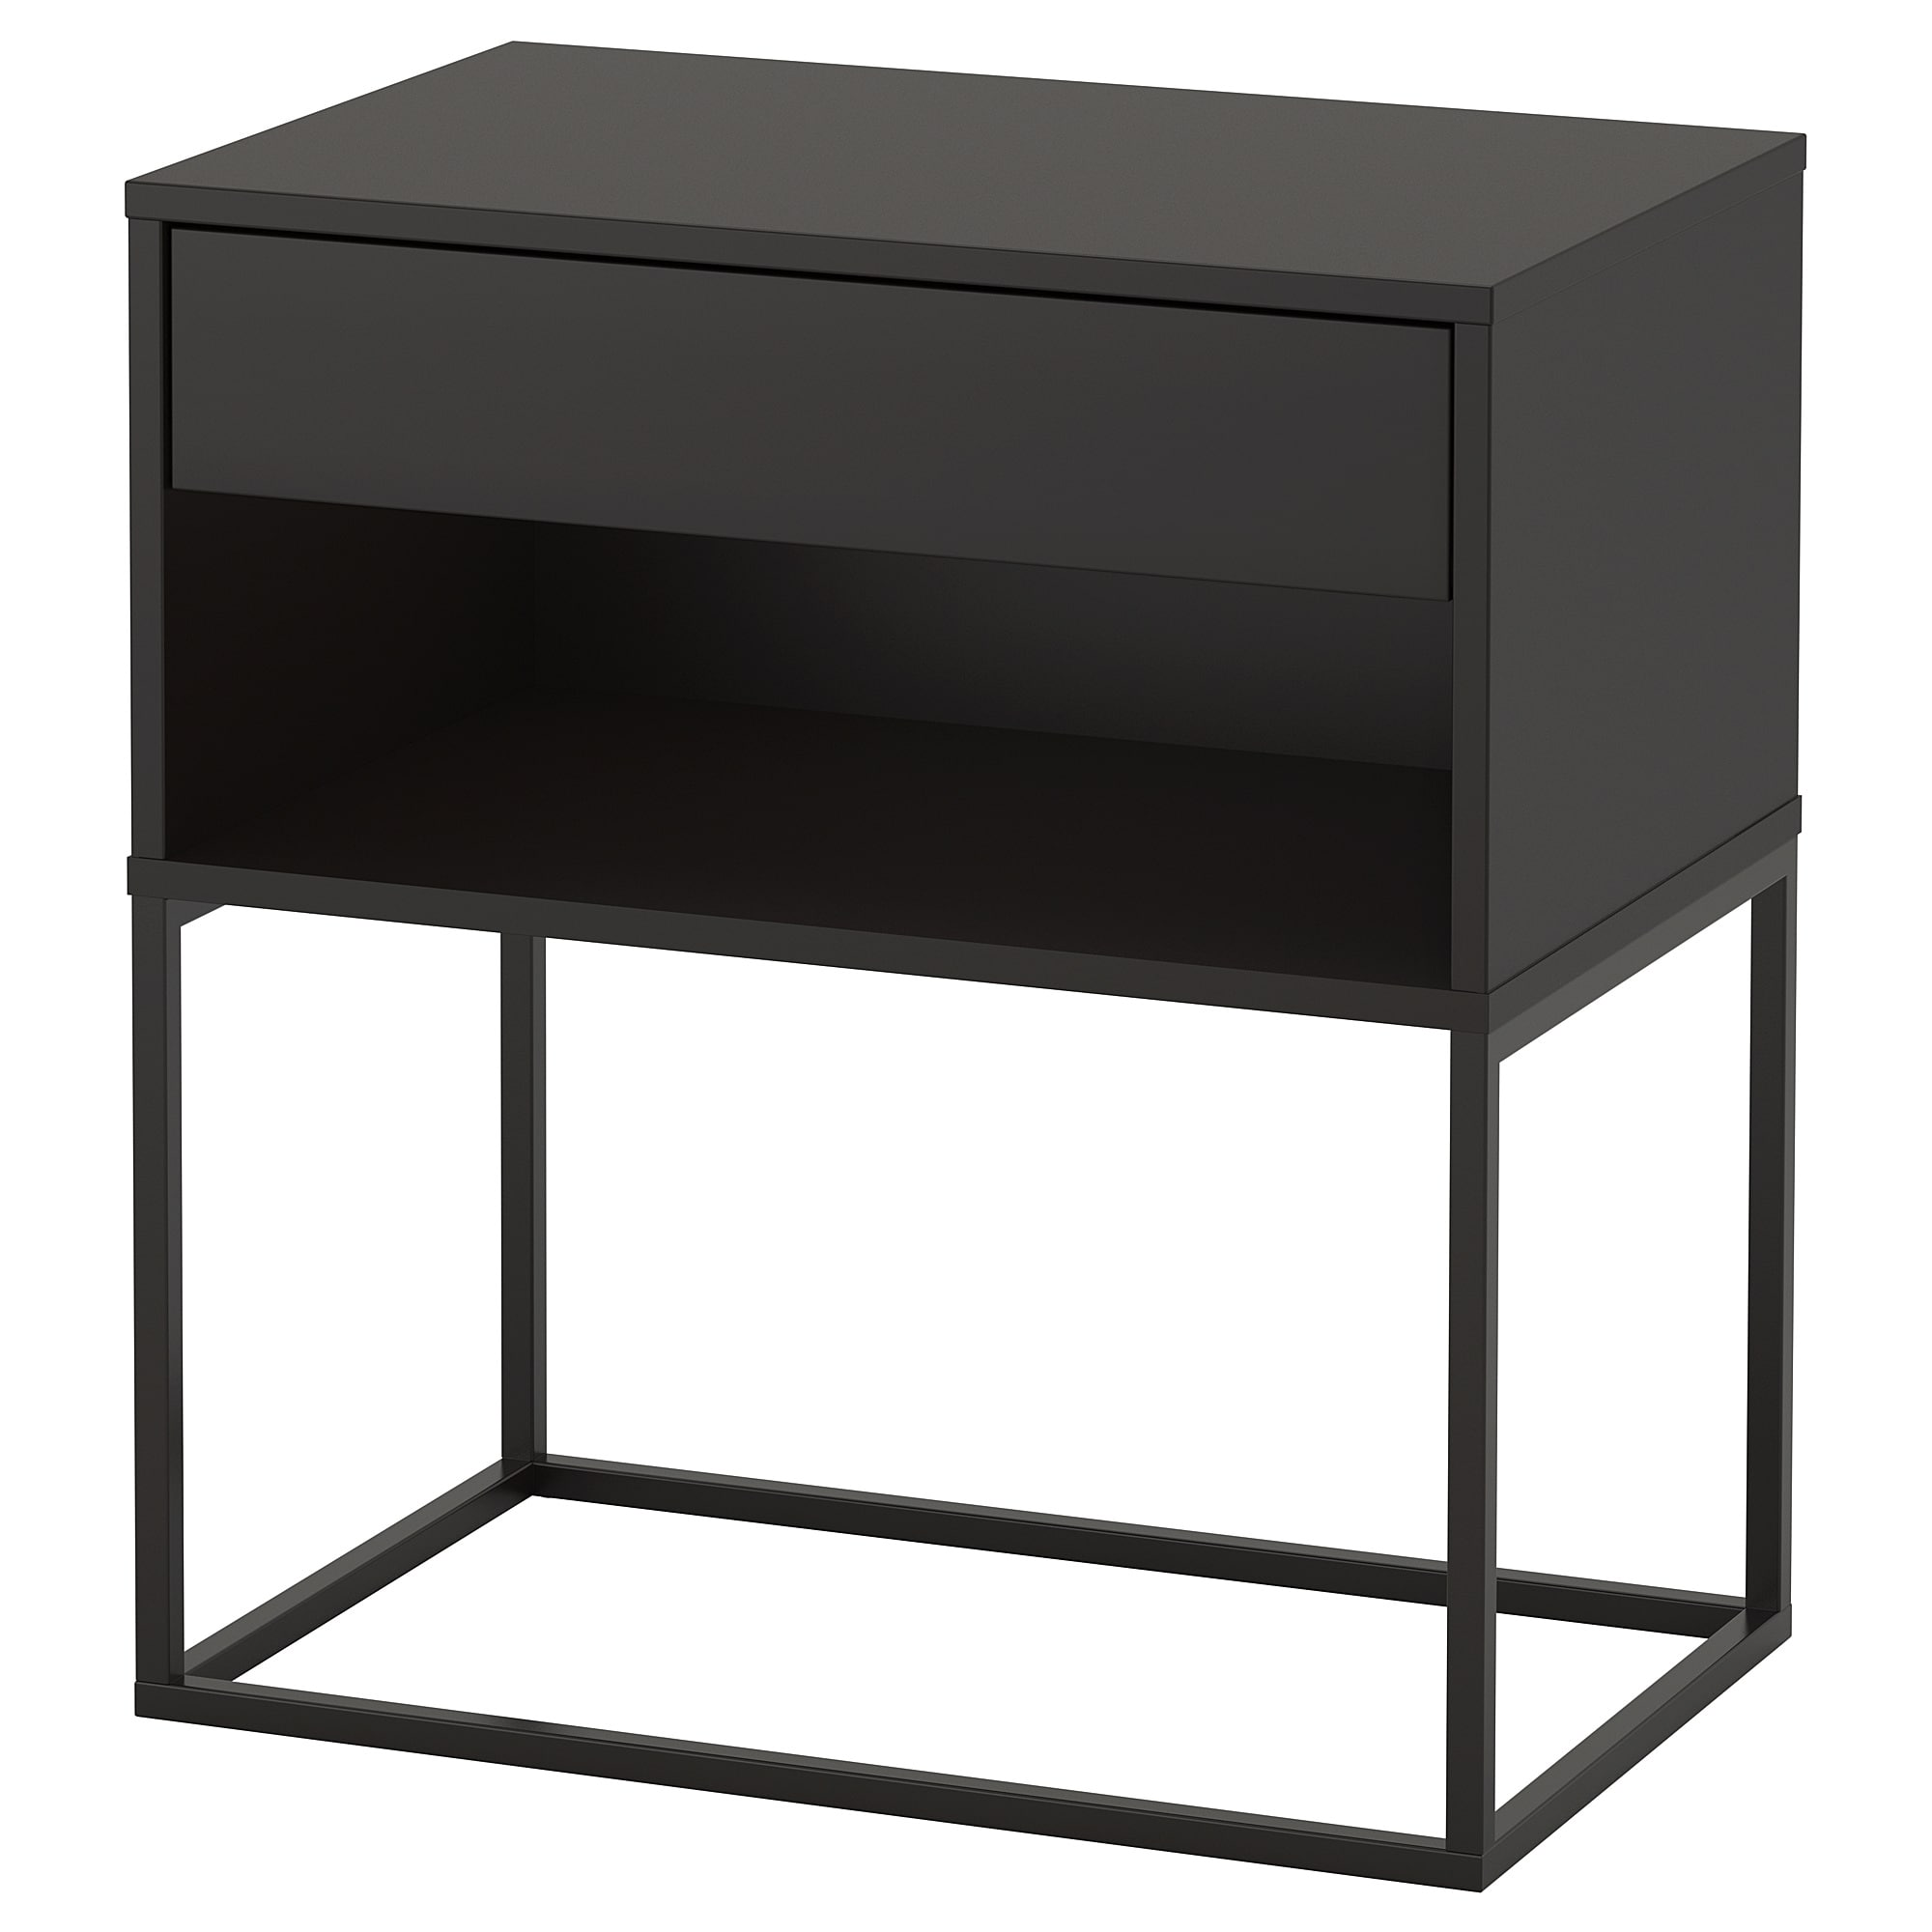 VIKHAMMER Bedside table, white, 4x4 cm - IKEA  Black bedside